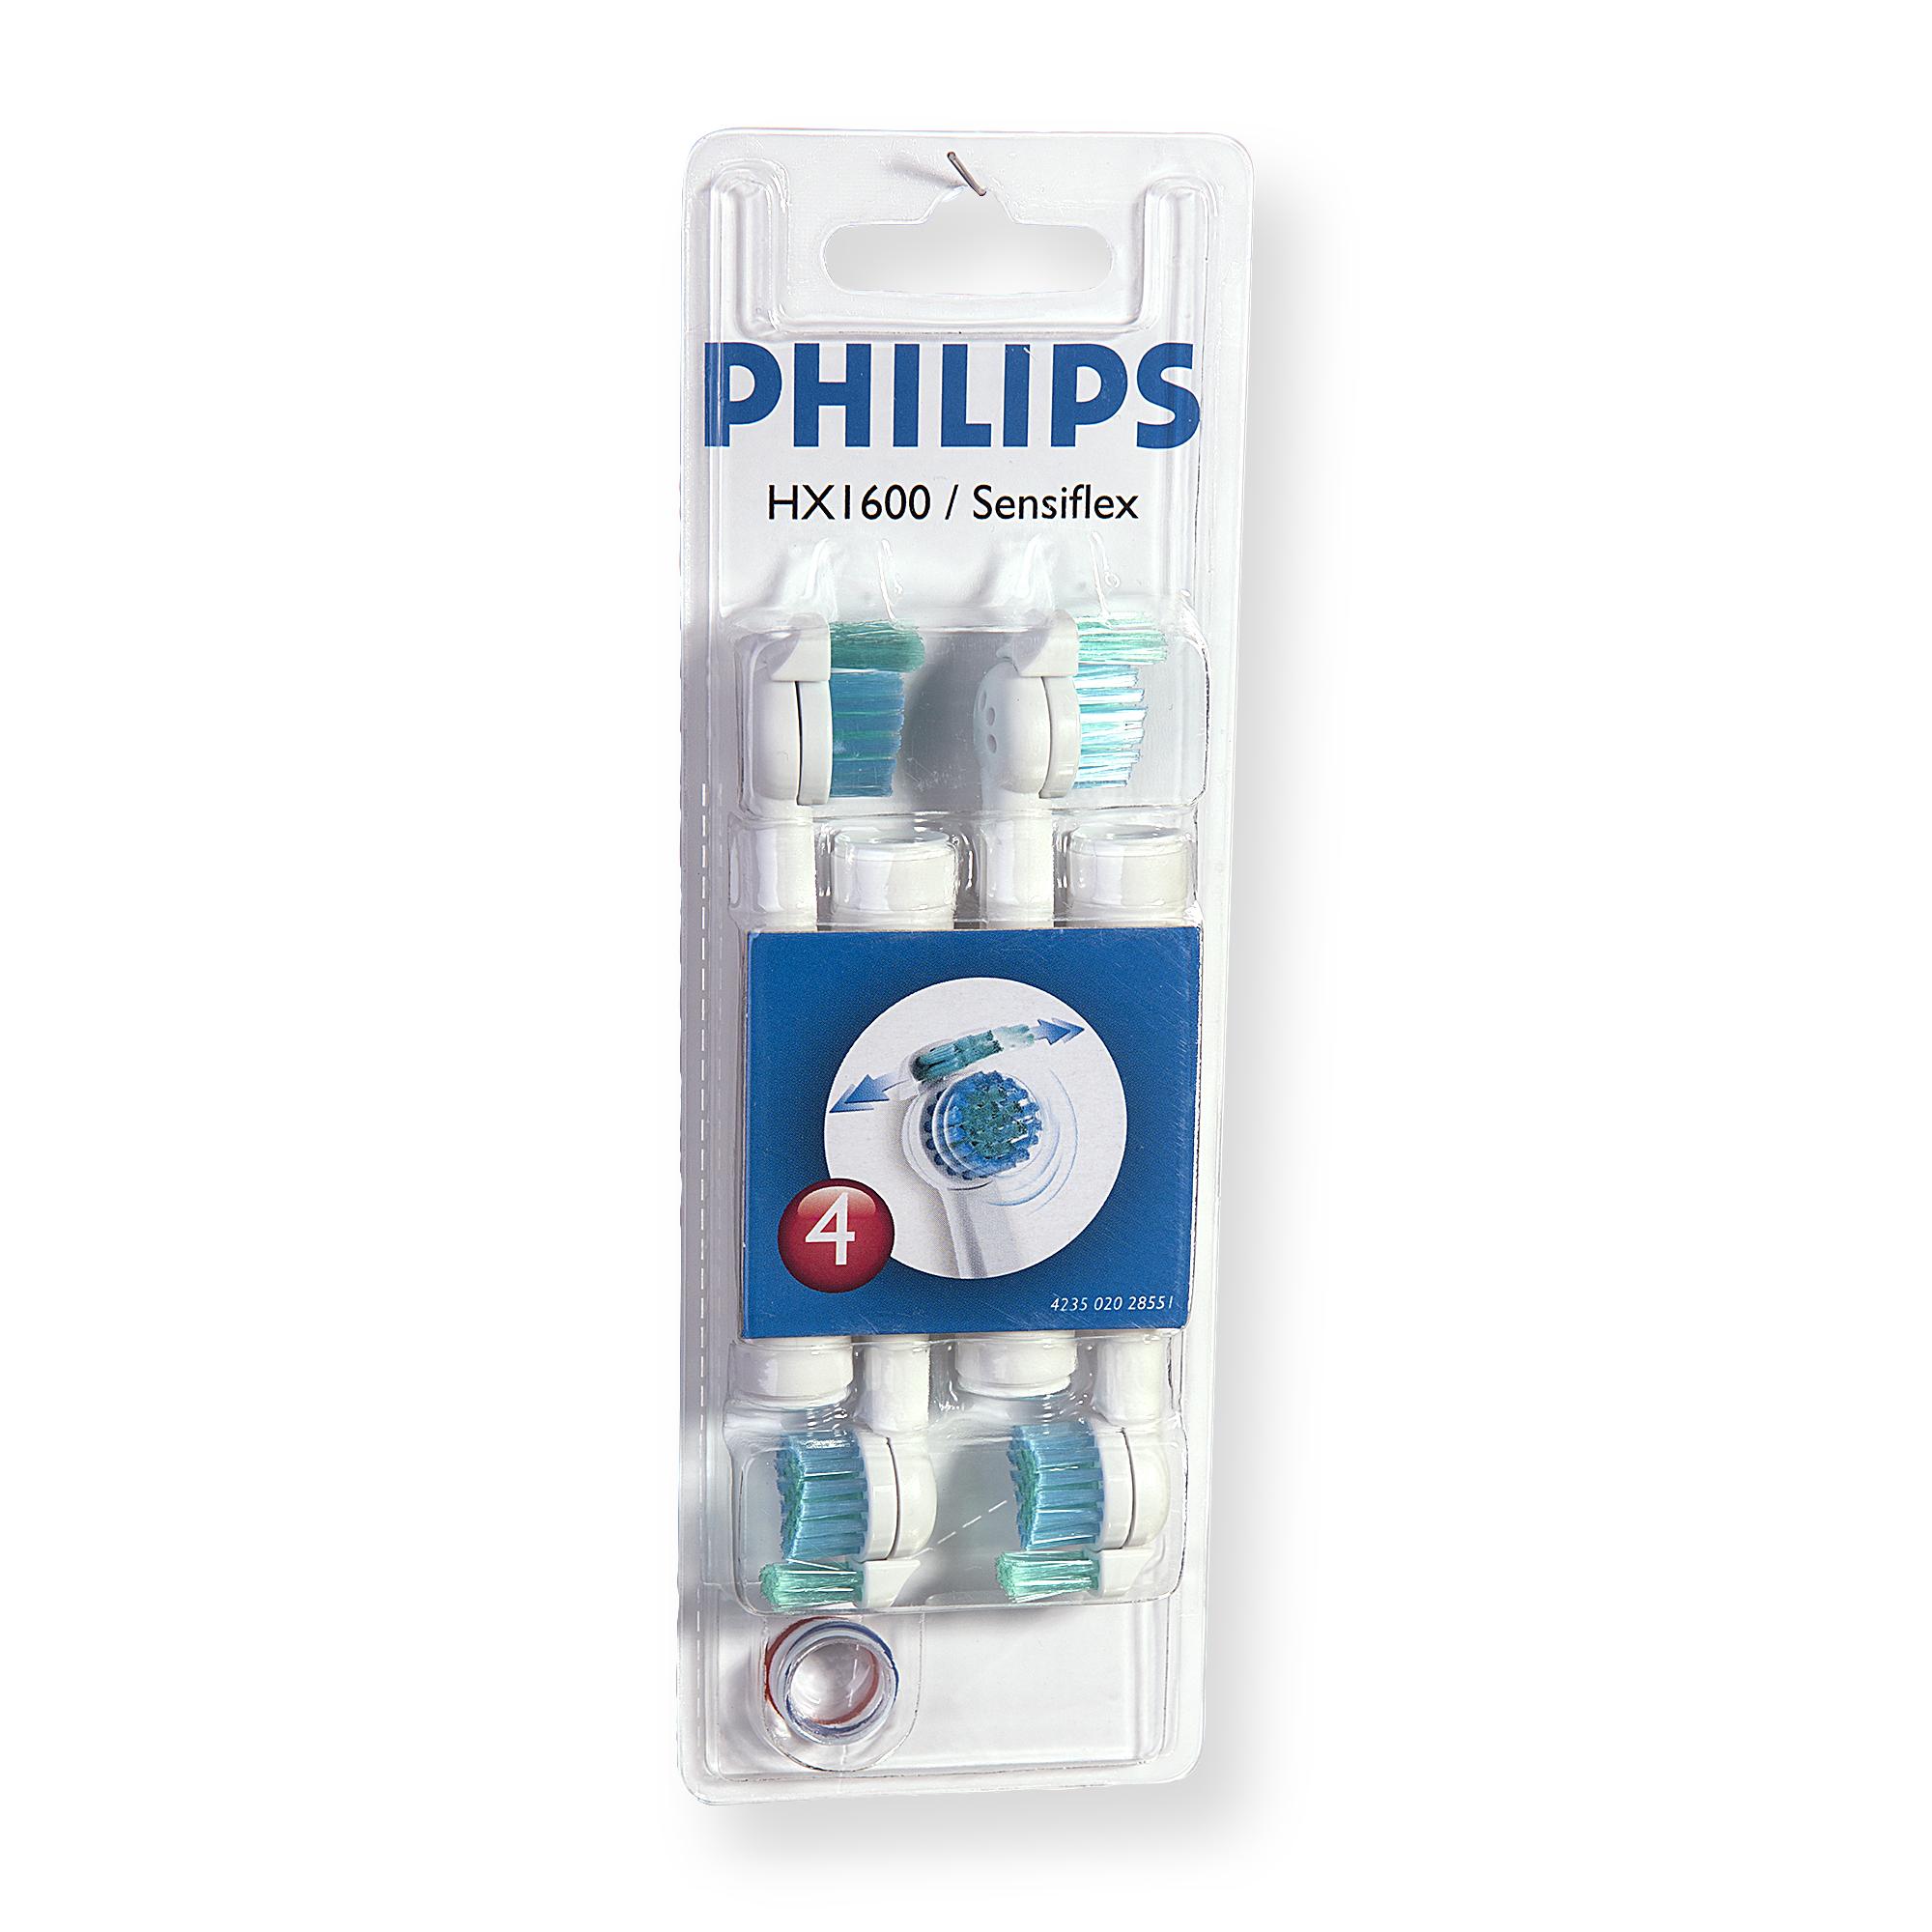 Philips Sonicare tandenborstels (Sensiflex A4) HX2014